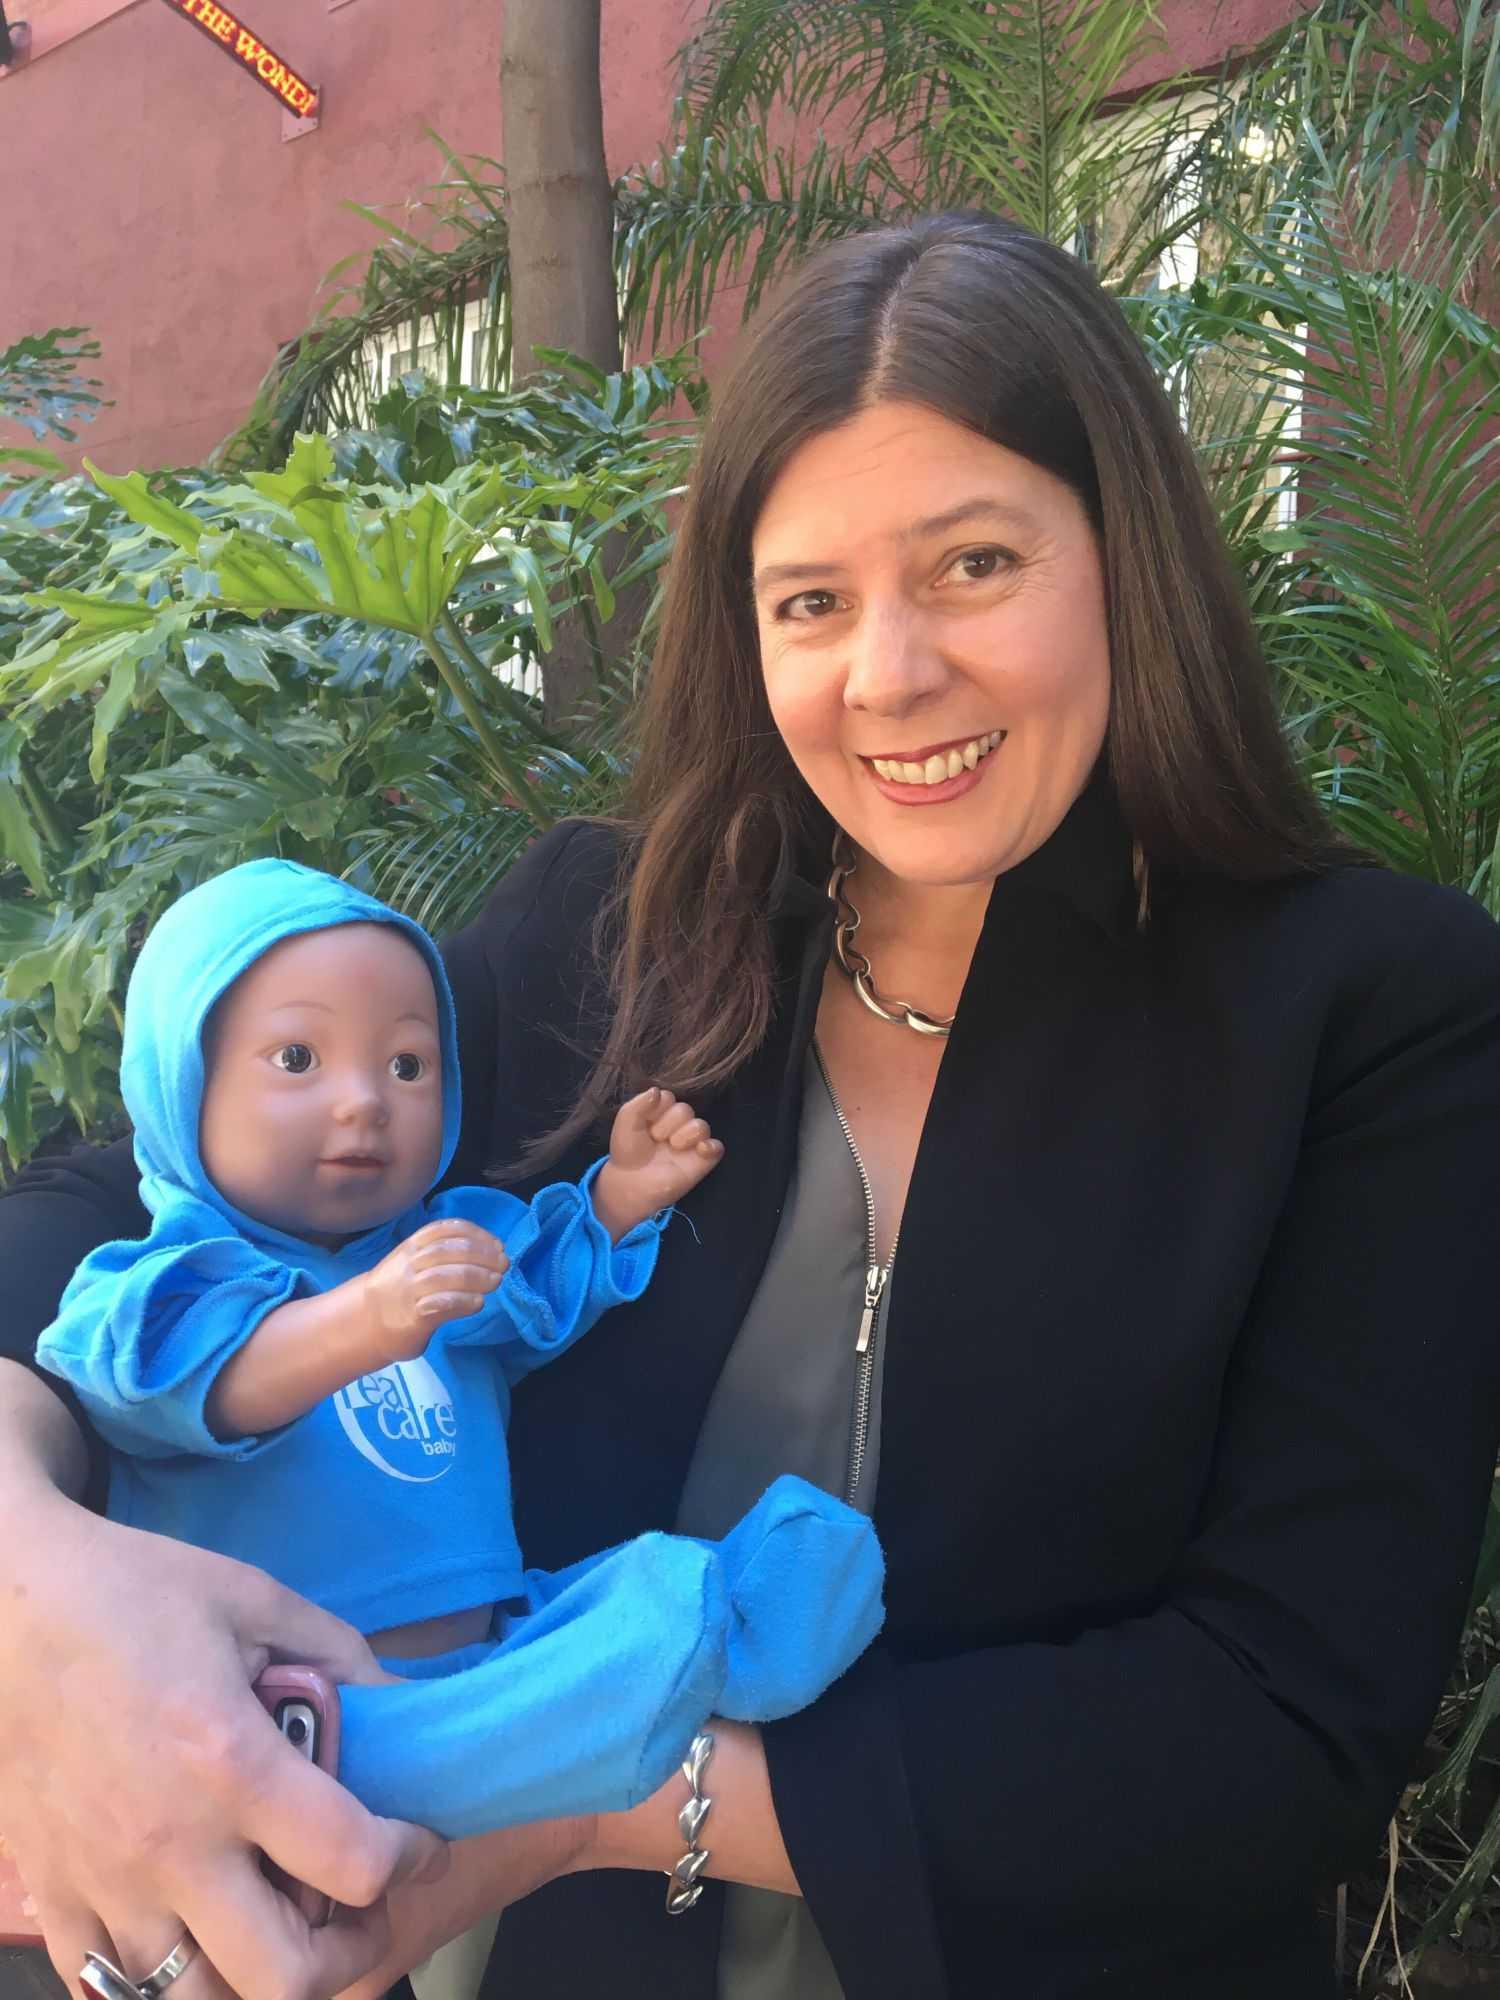 Sally Brinkman mit Roboterbaby